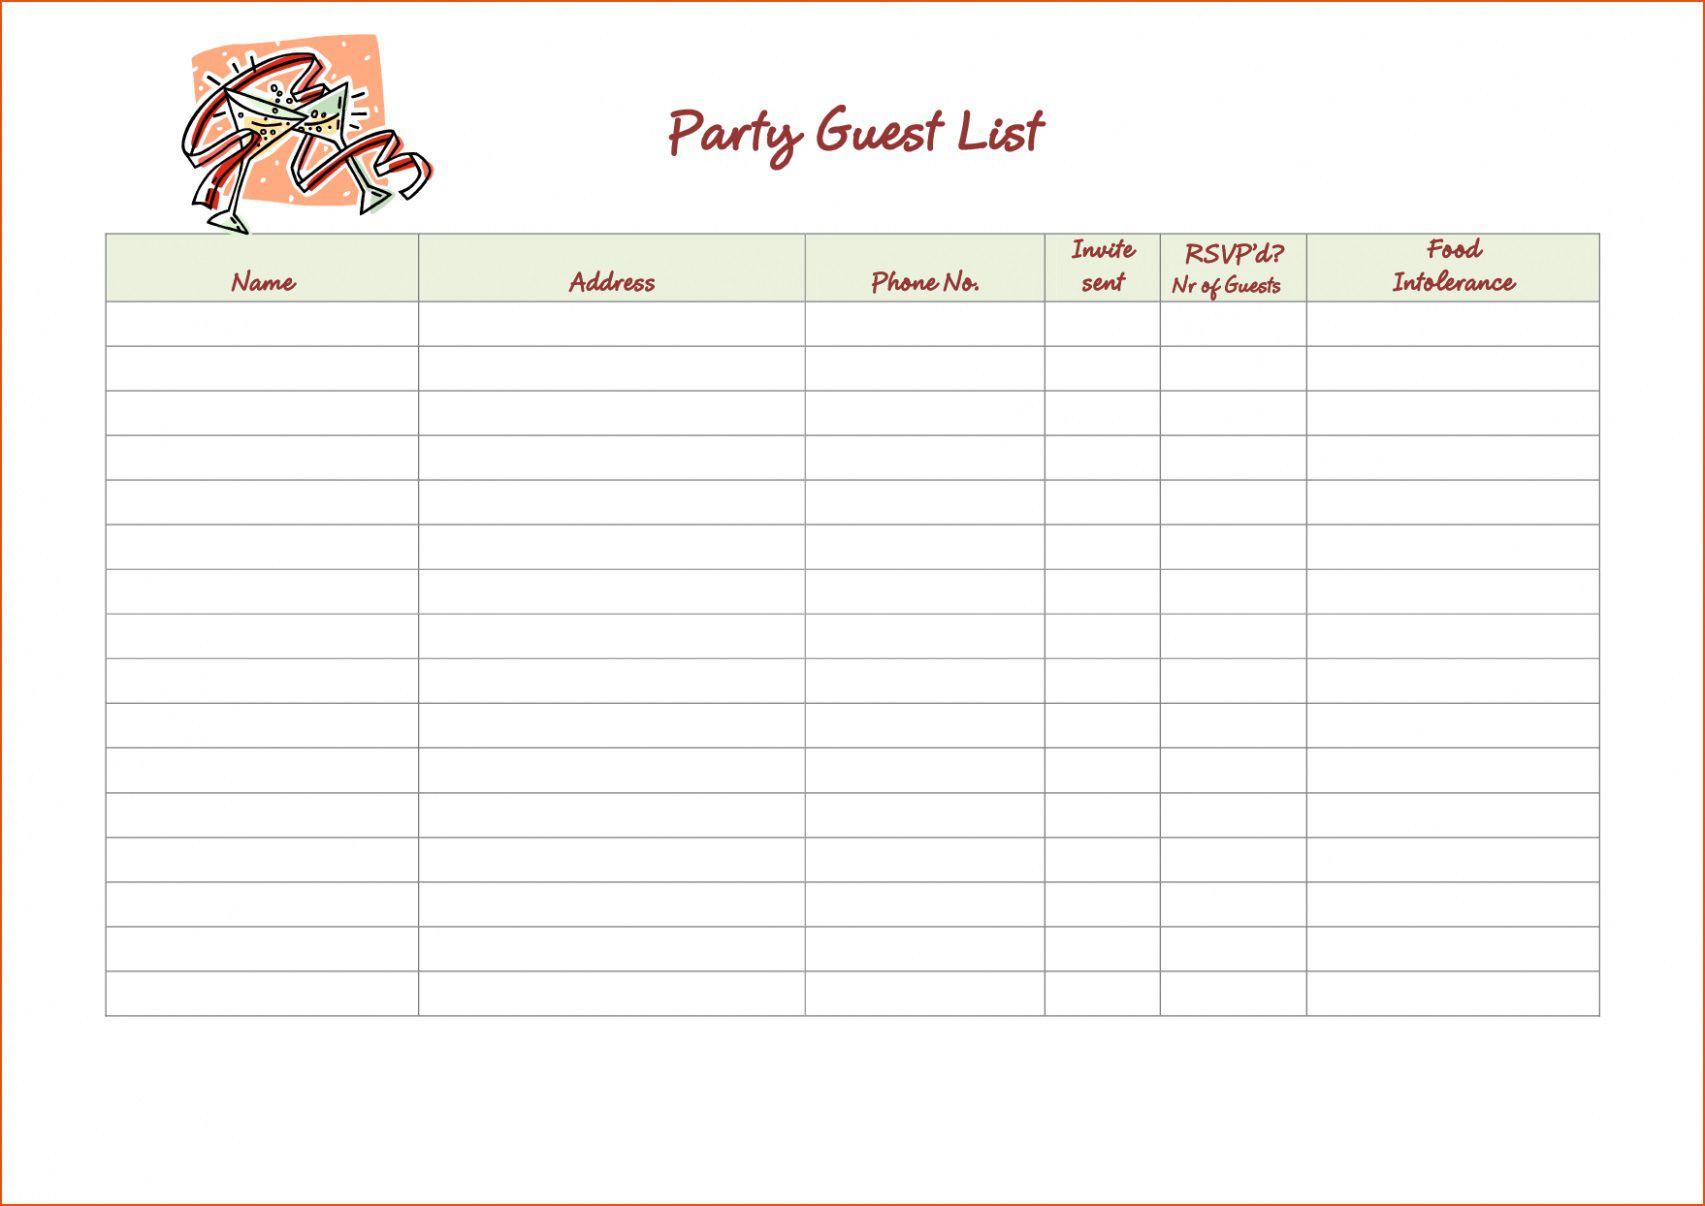 002 Phenomenal Wedding Party List Template Design  Printable MemberFull